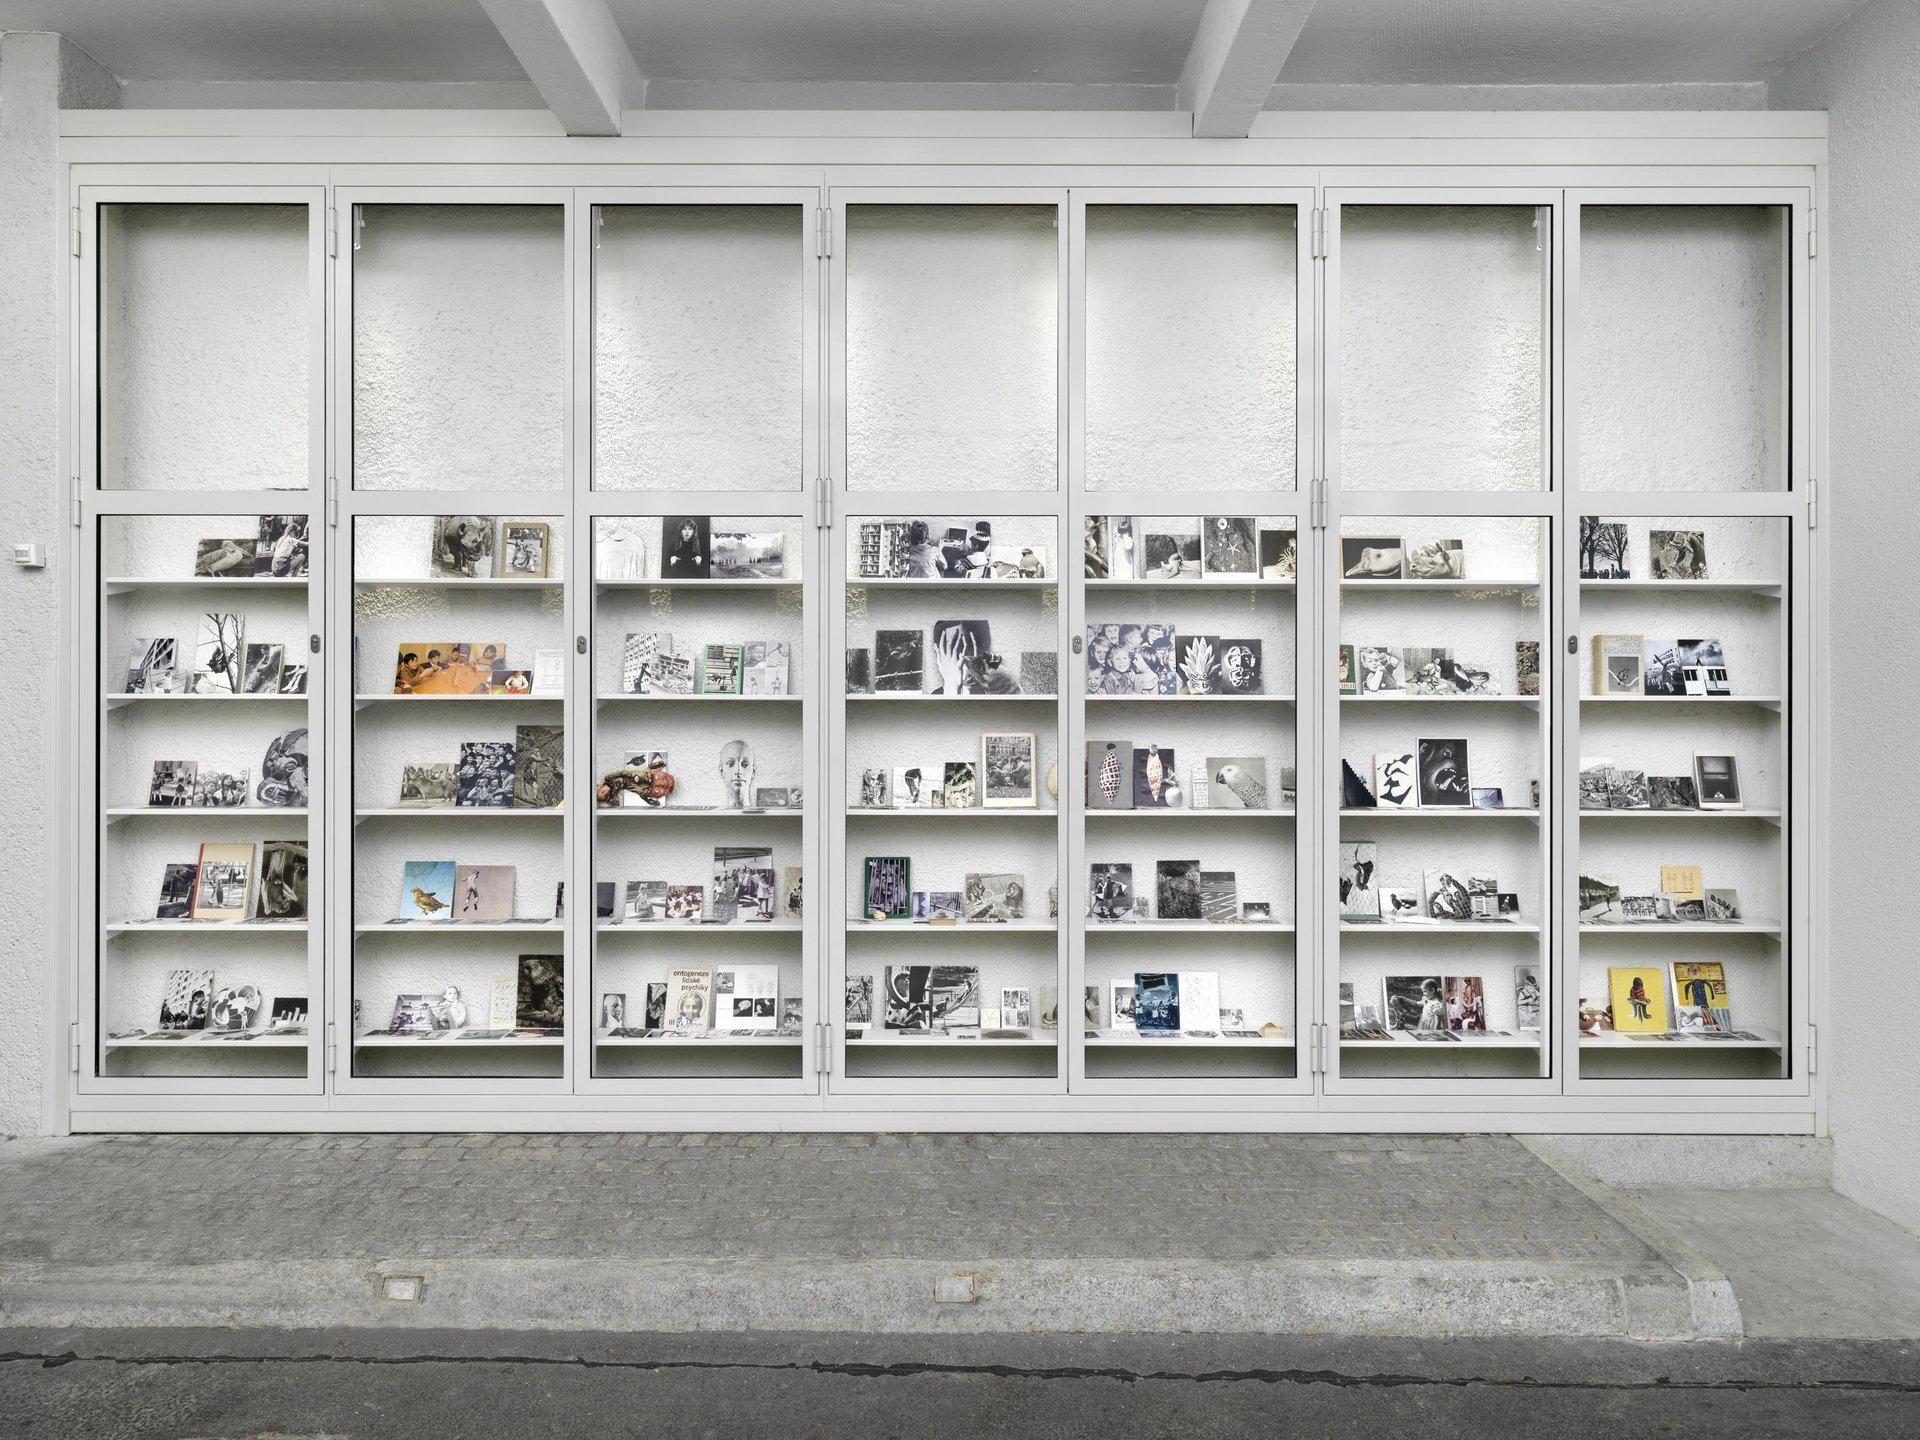 Eva Kot'átková, Psychological Theatre, Collection of Oskar, A Boy, Who Talks through Images, 2014